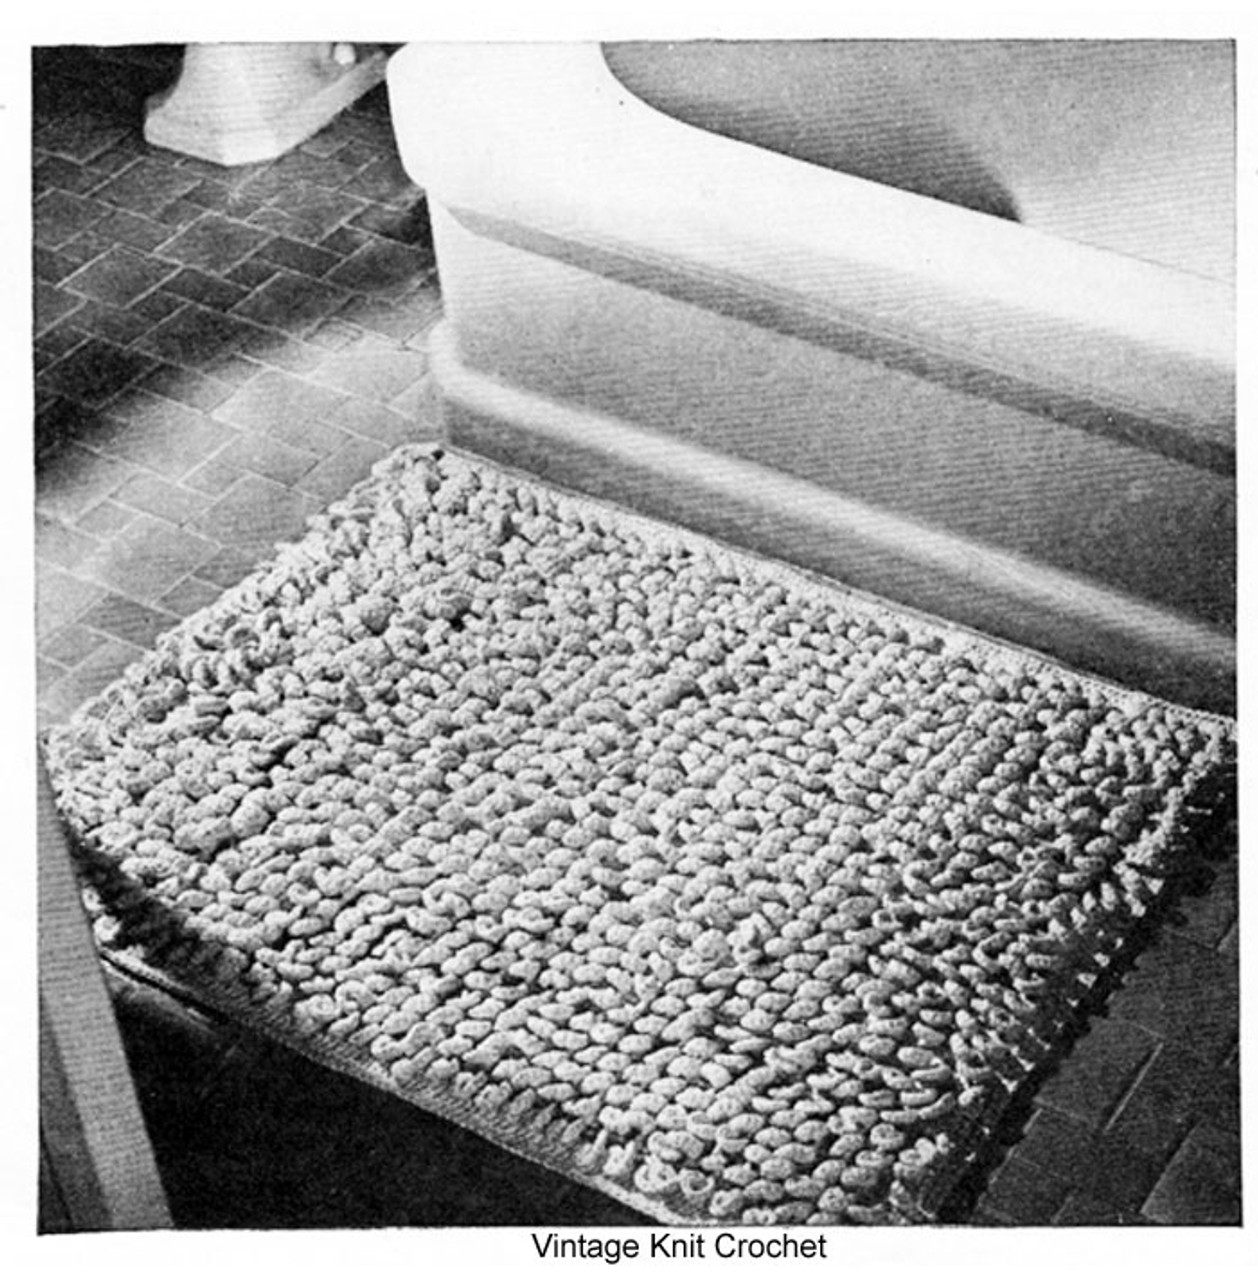 Vintage Bathroom Rug Crochet Pattern No 9400